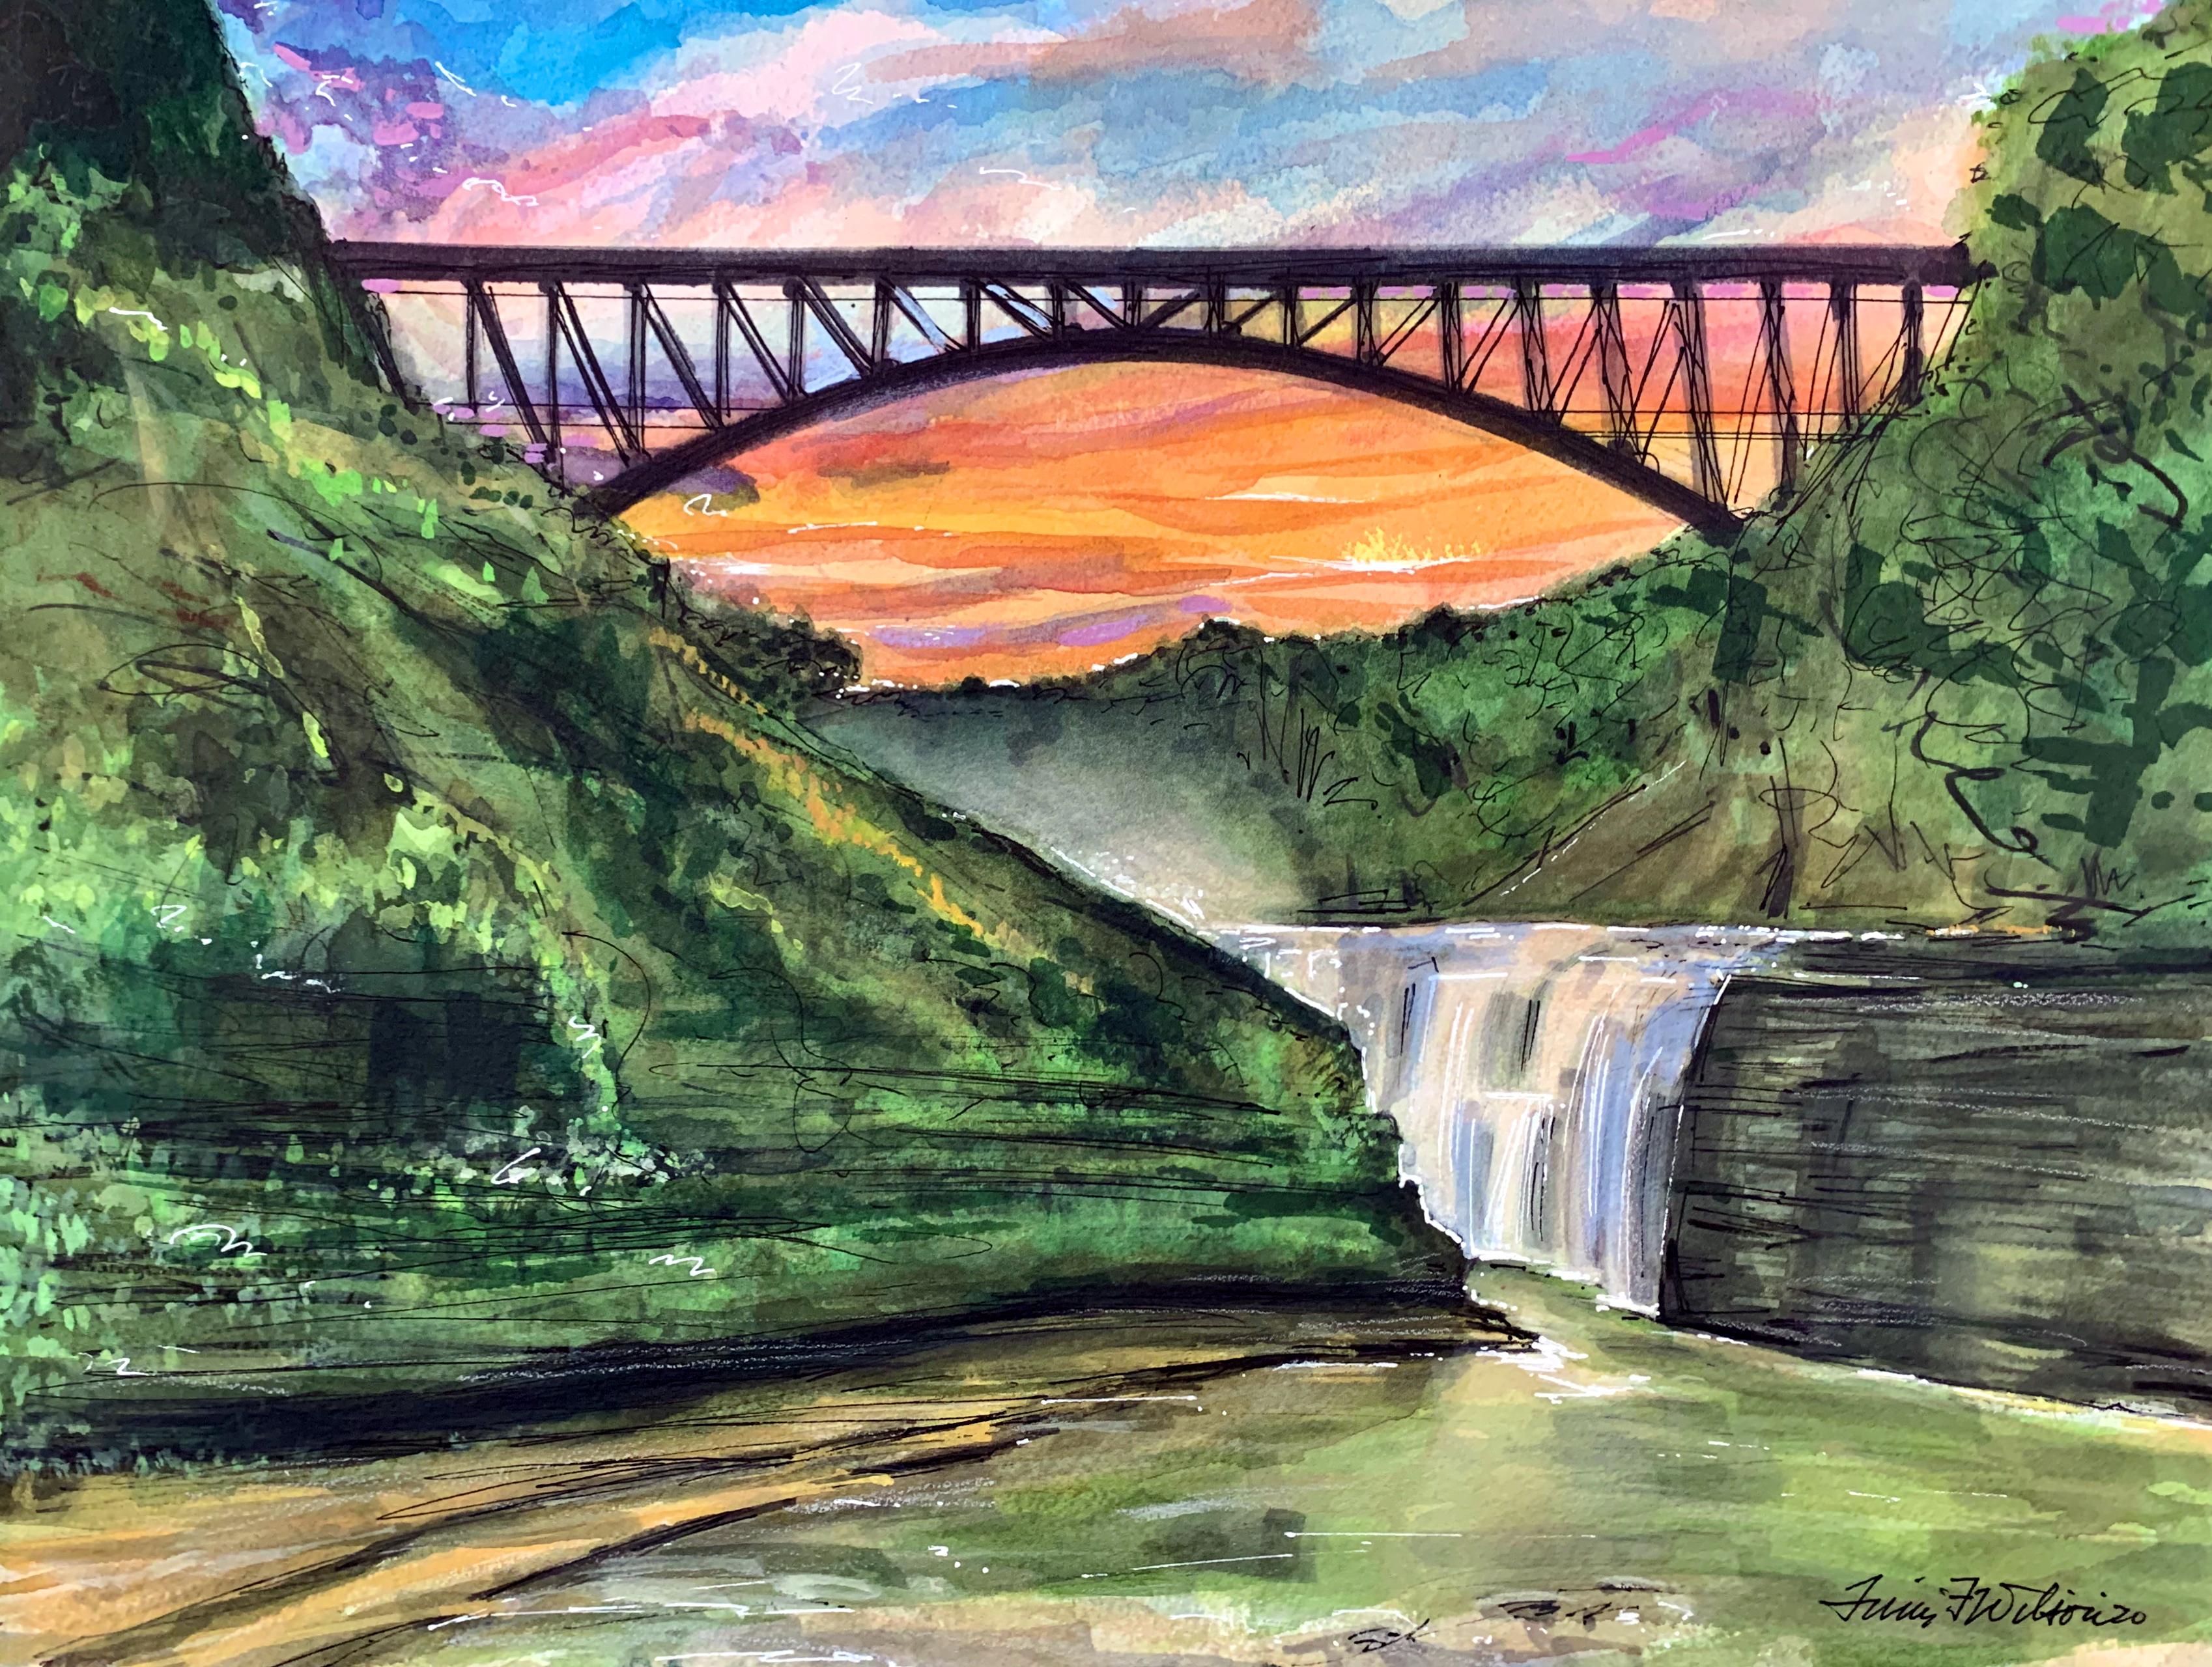 Letchworth State Park - Upper Falls